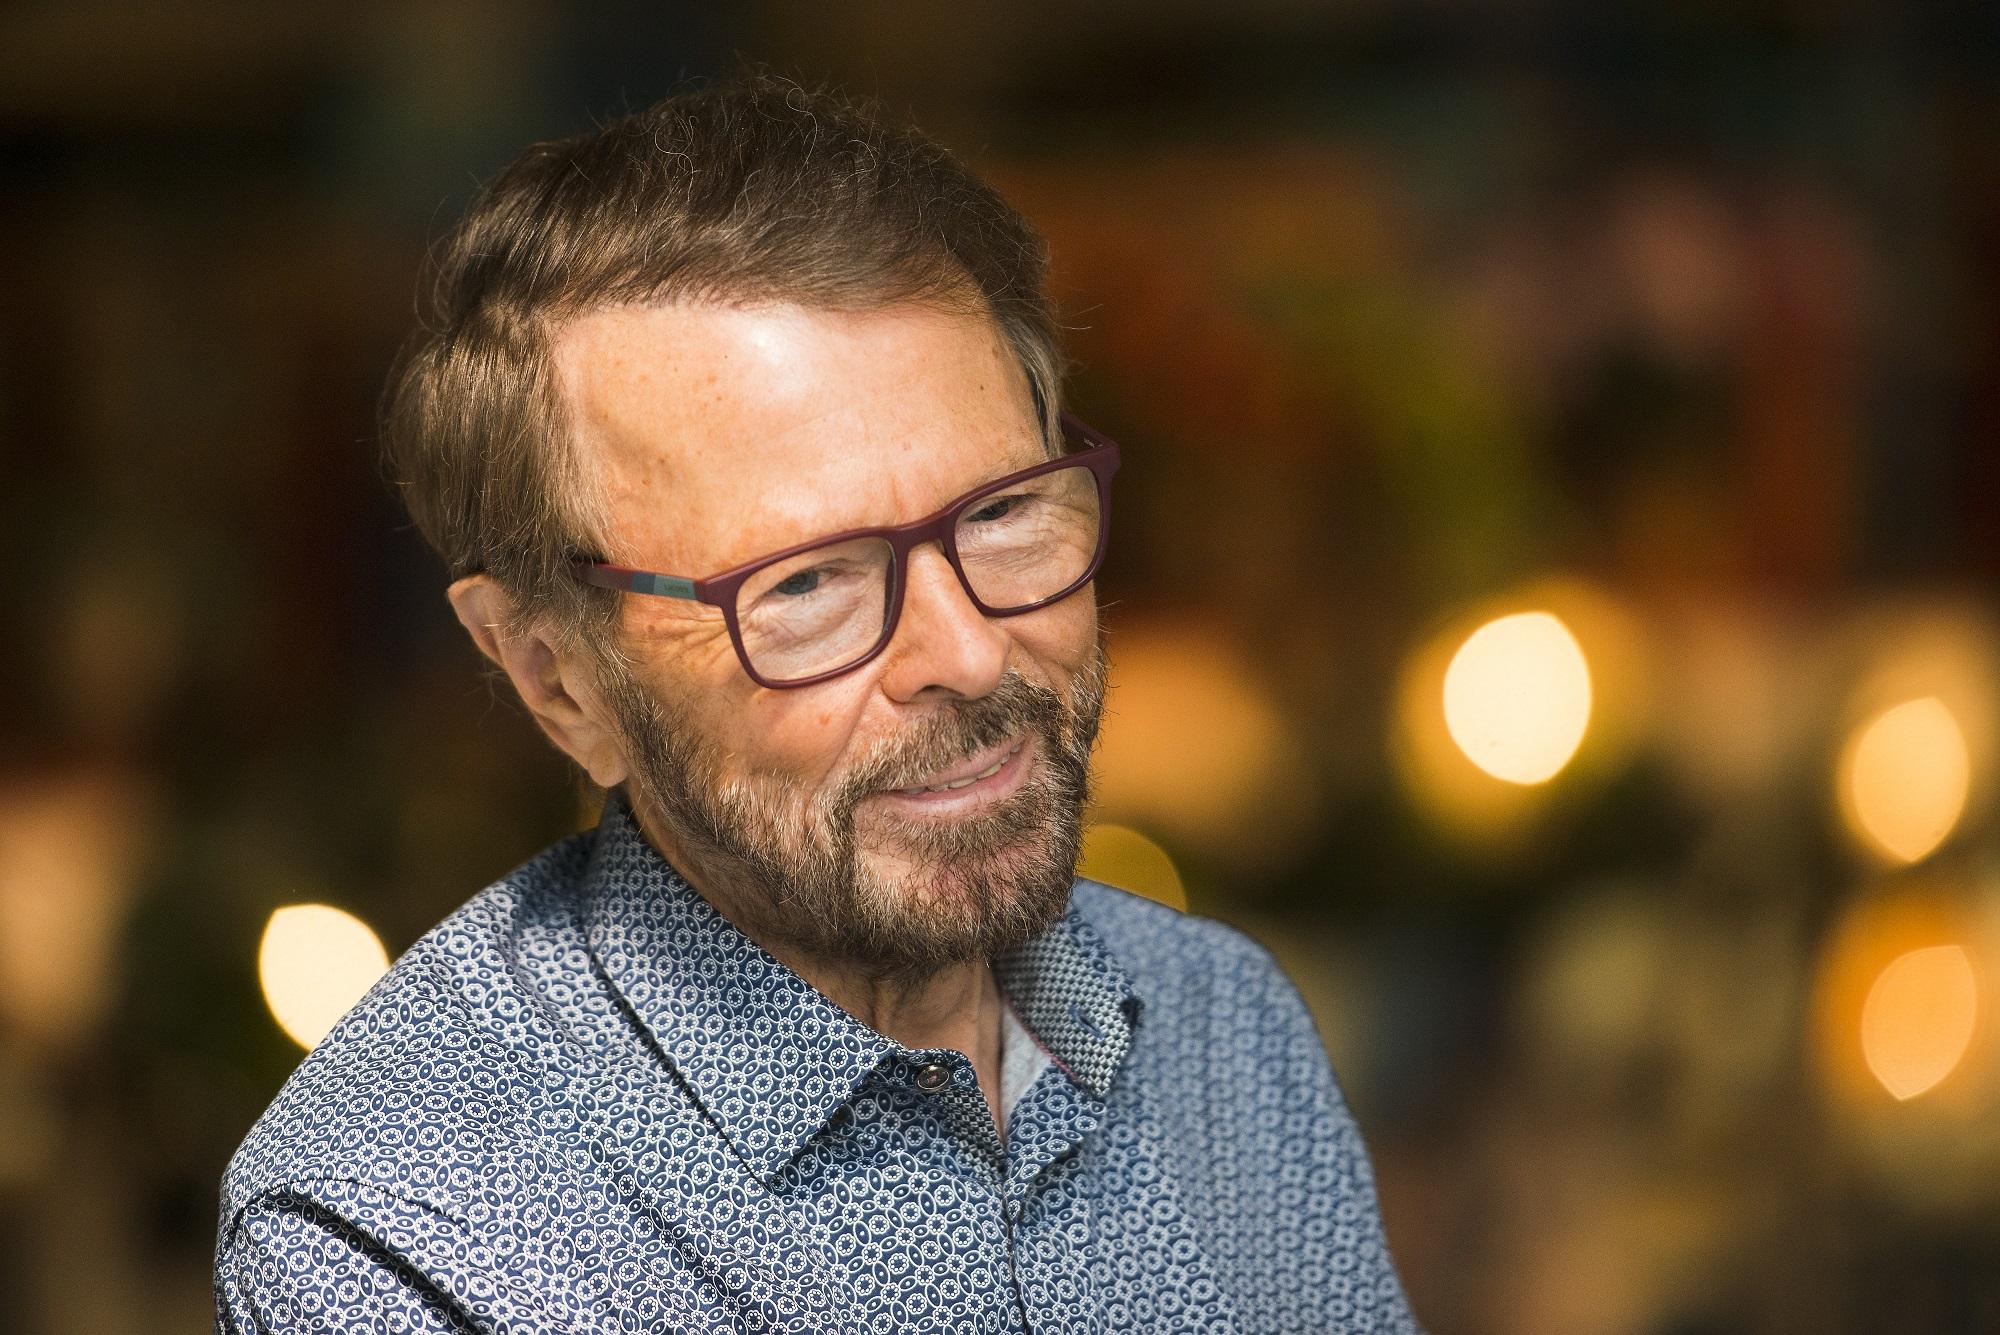 Björn Ulvaeus Biography